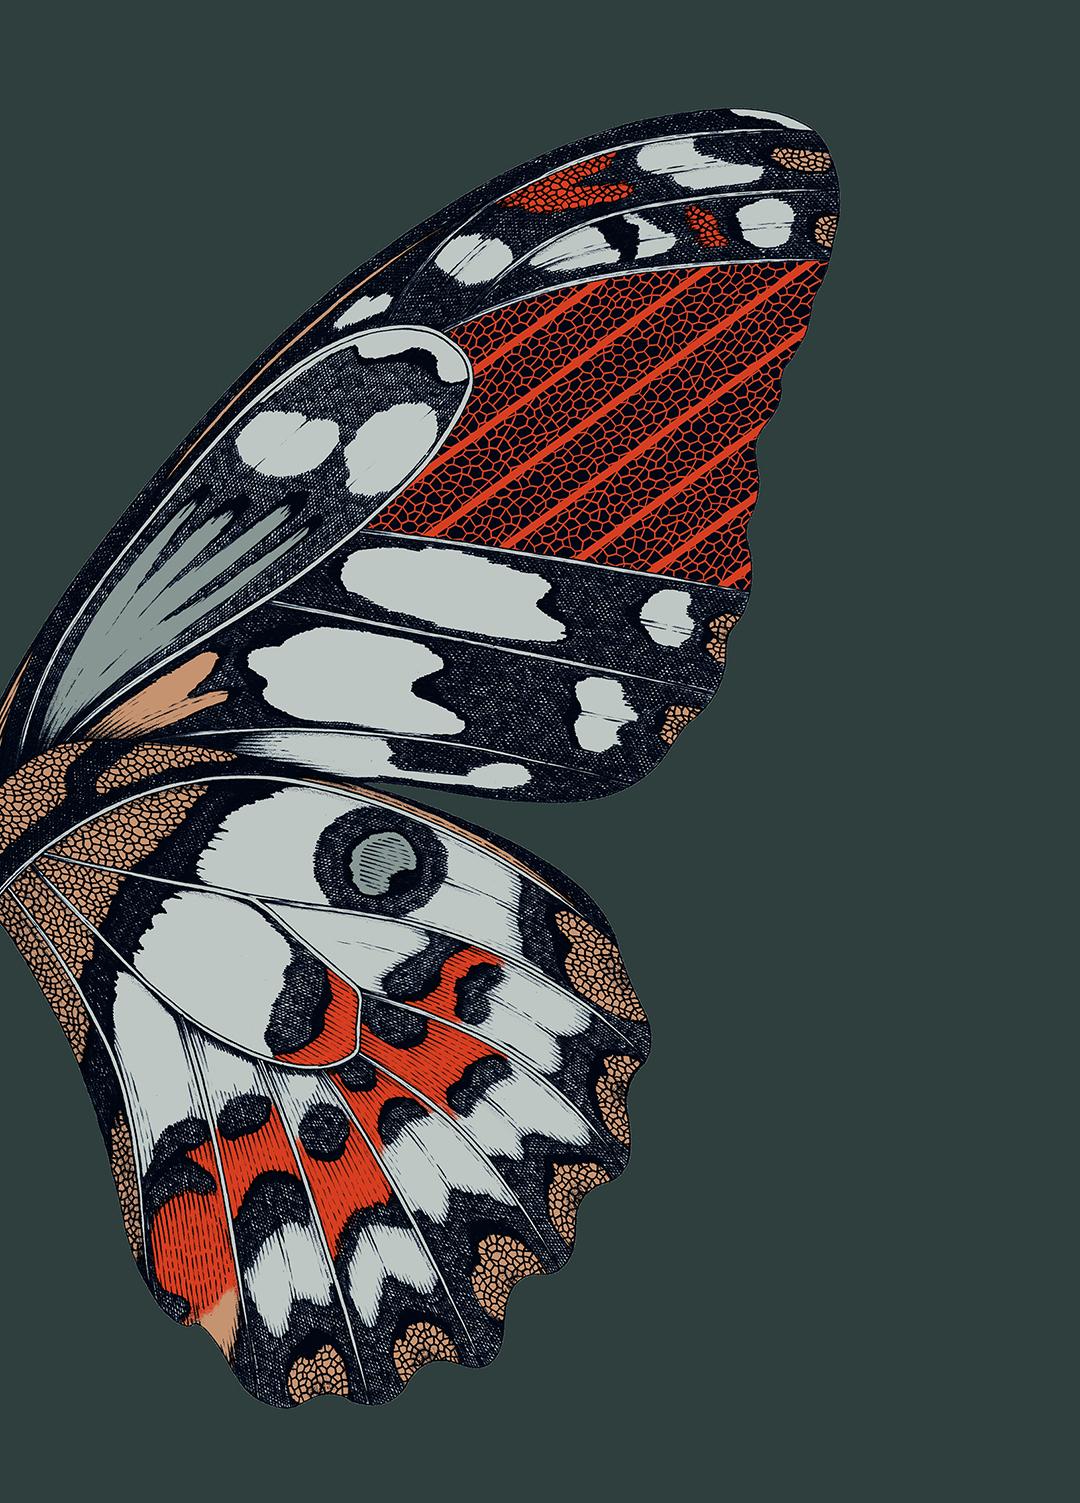 GirlsclubAsia-Artist-Suthipa Kamyam-rs_Artwork_Butterfly_Color1